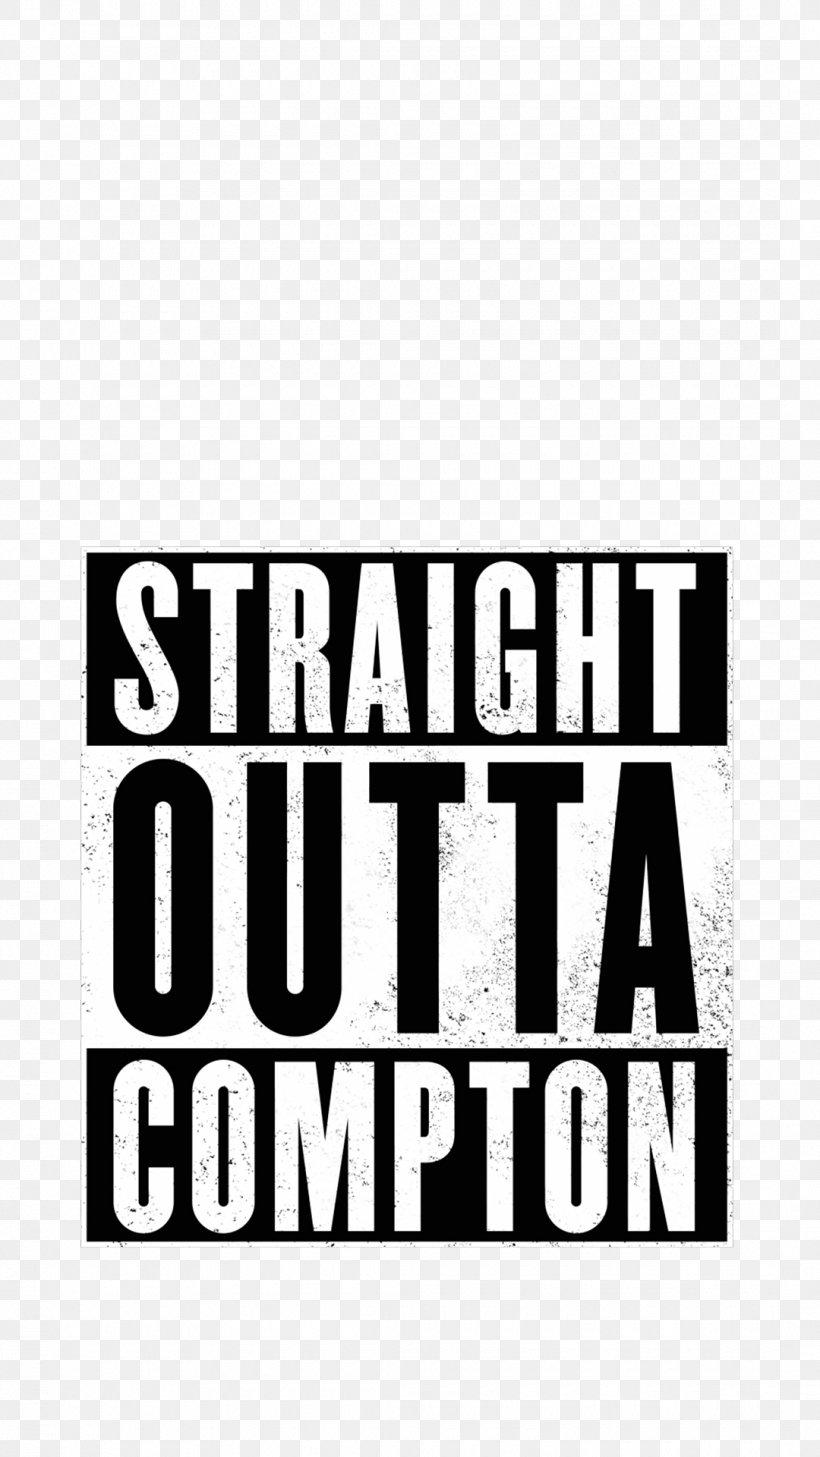 Straight Outta Compton N W A Gangsta Rap Hip Hop Png